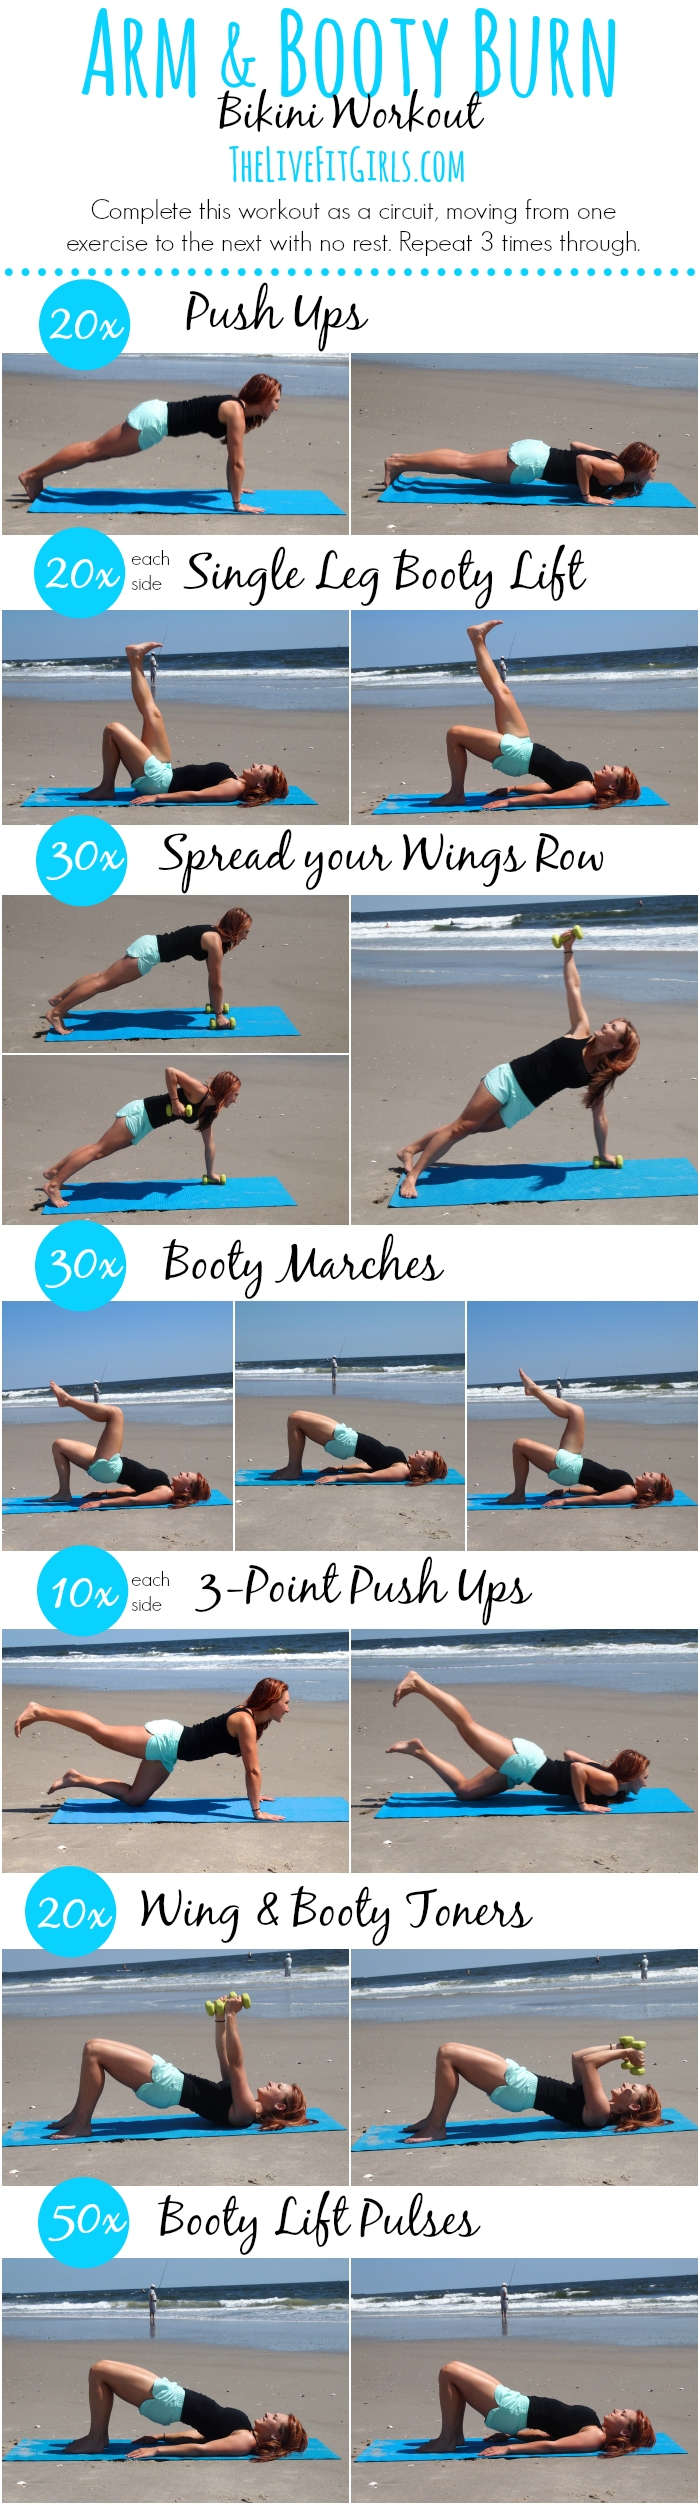 Arms and Booty Burn! Bikini Workout #weightlossmotivation